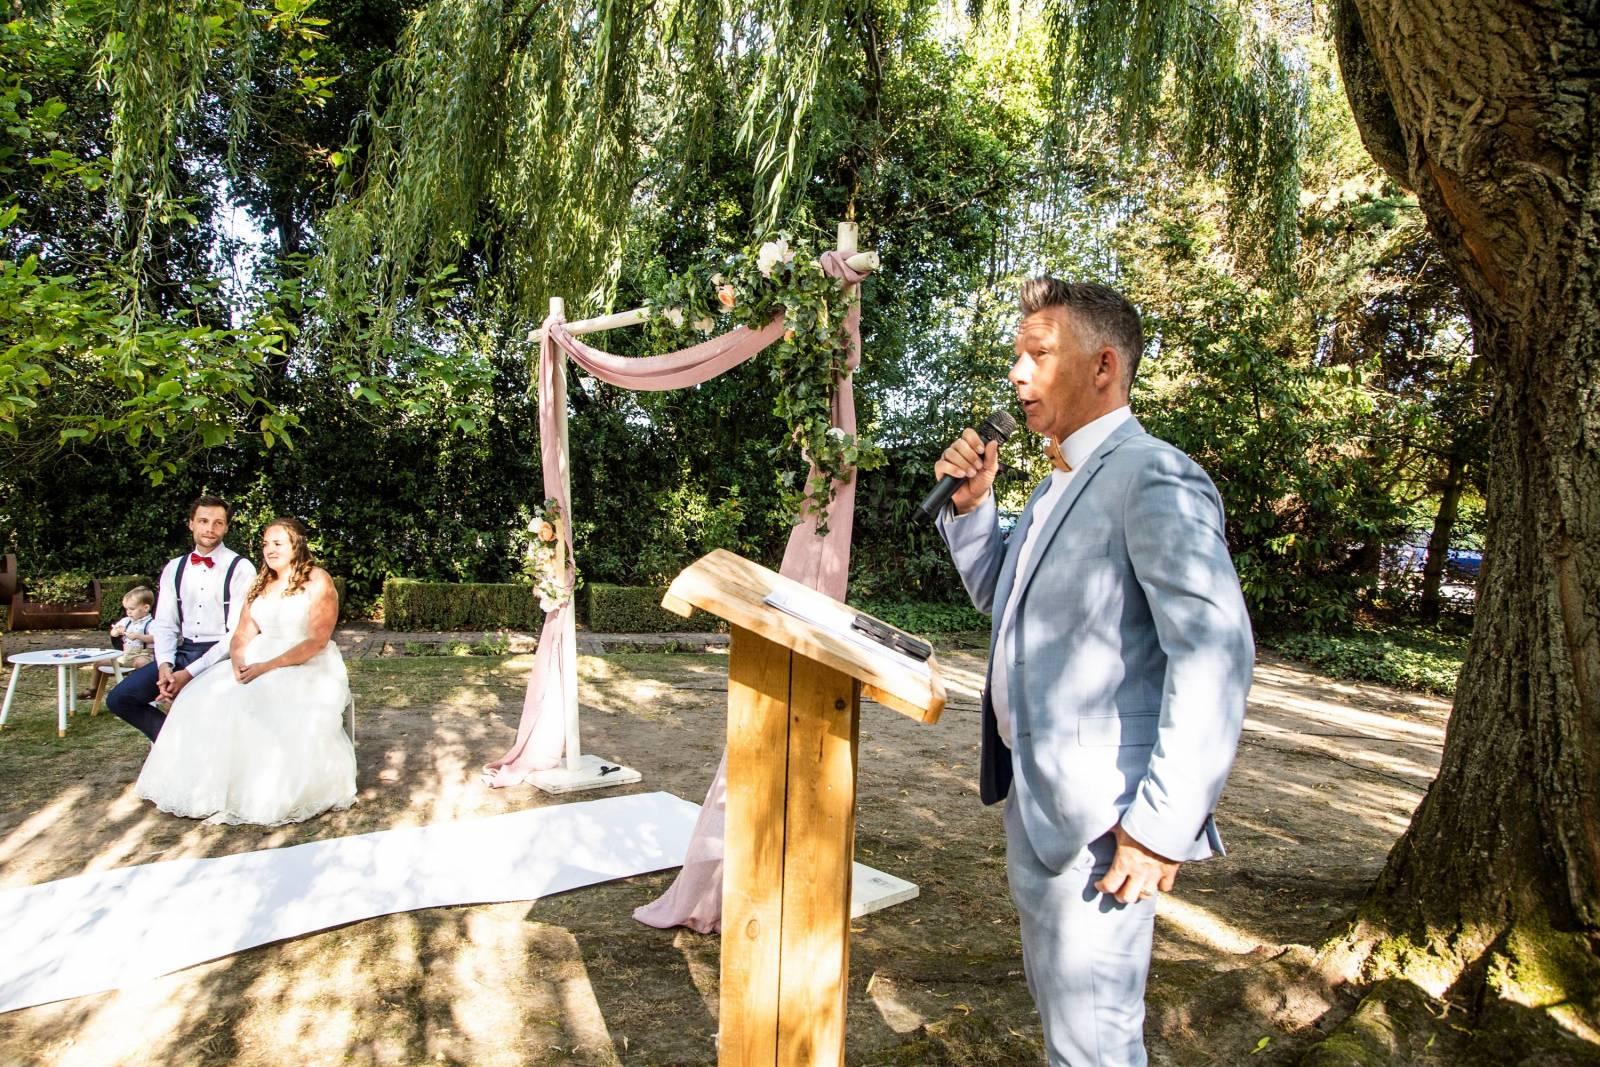 Live 4 Love - Ceremoniespreker - House of Weddings - 10